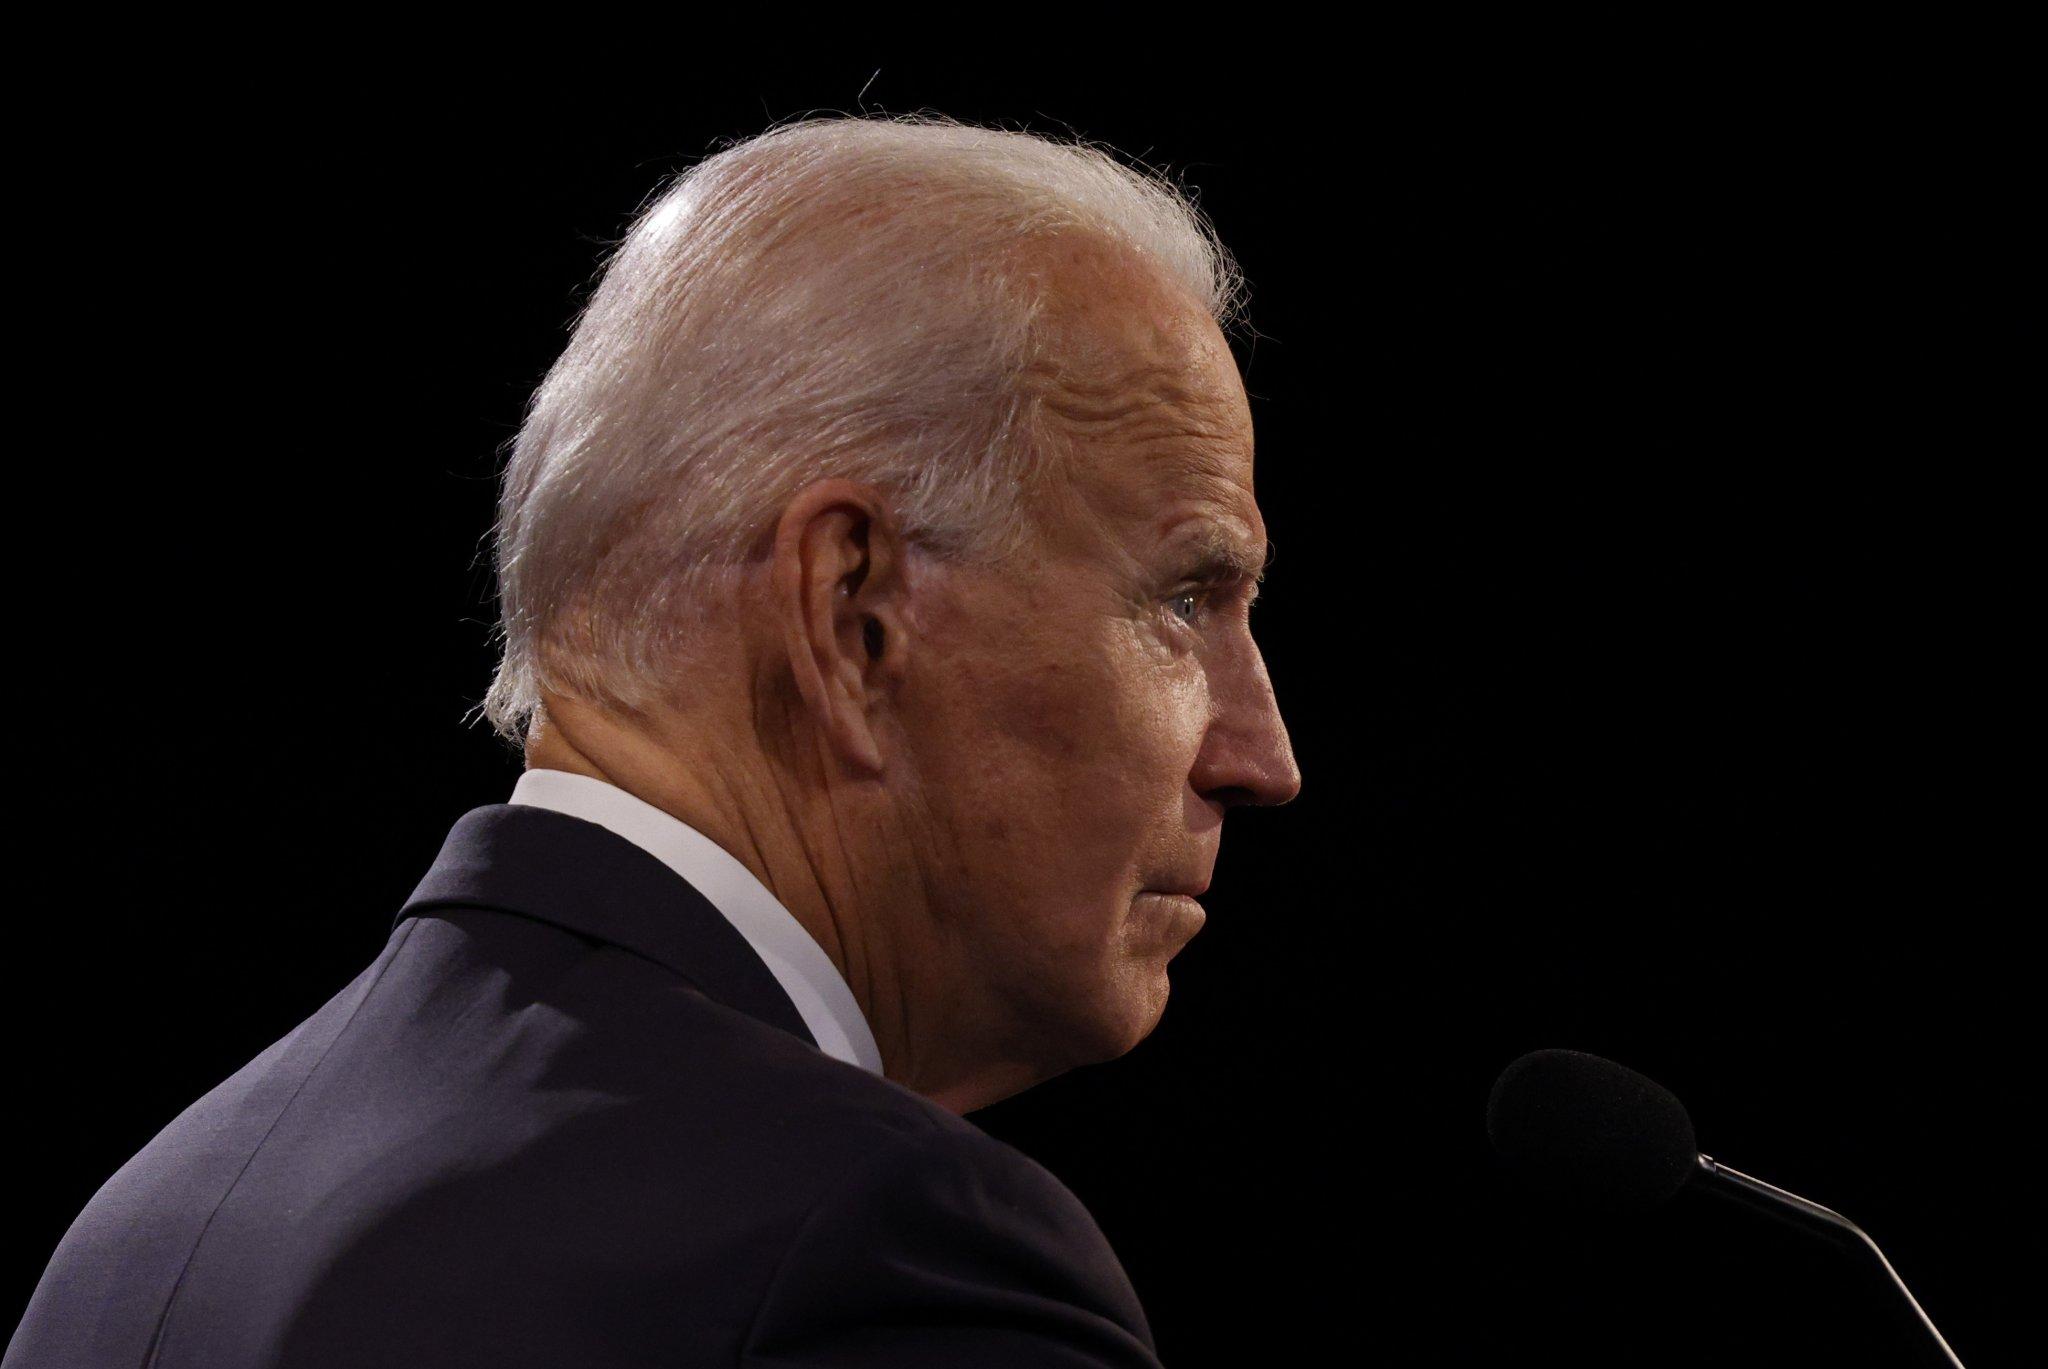 News organizations project Joe Biden will be next president of the United States